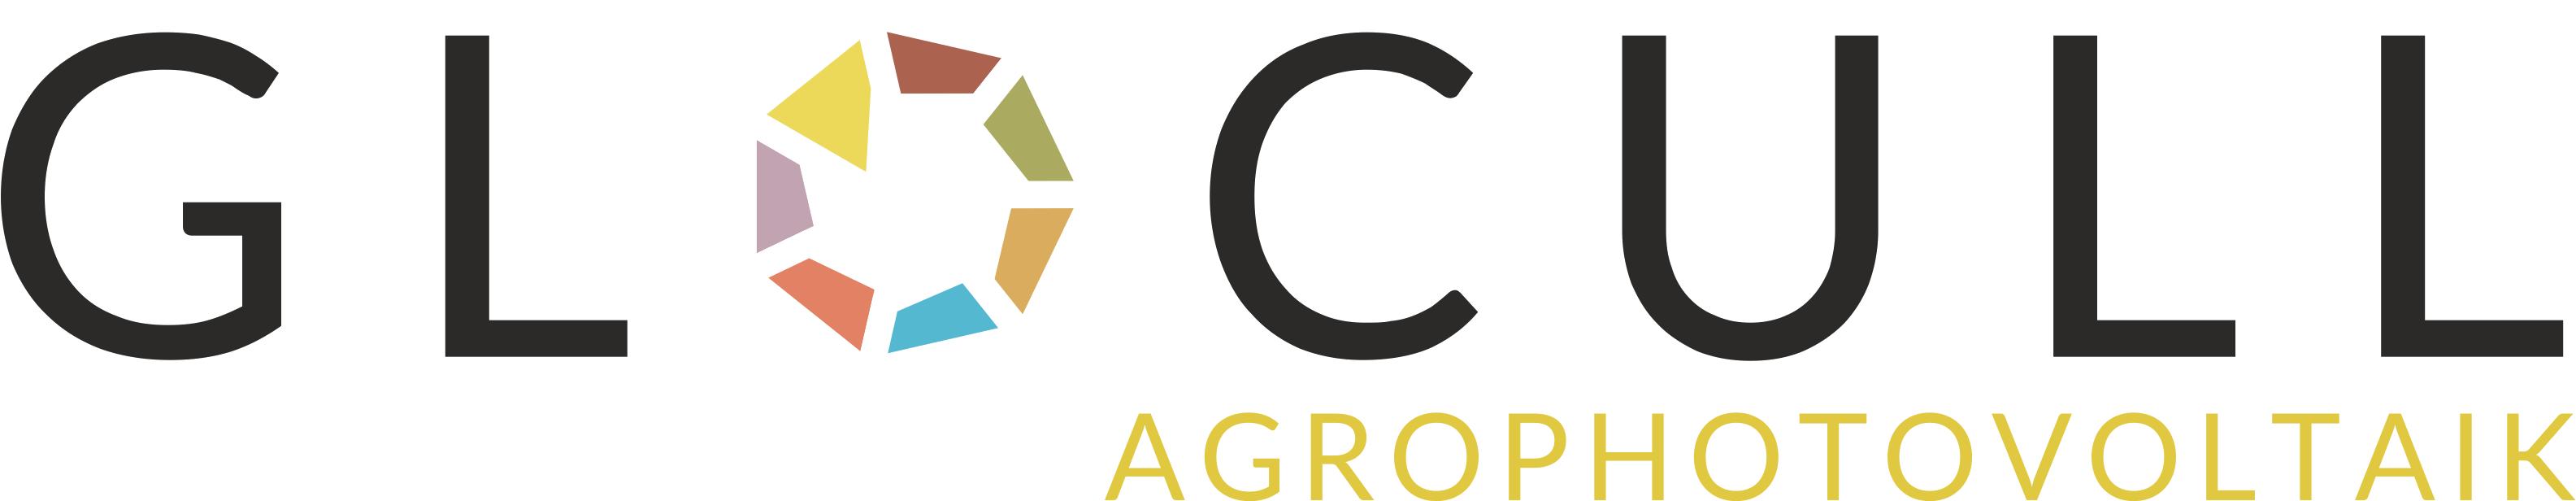 Agrophotovoltaik im Gartenbau